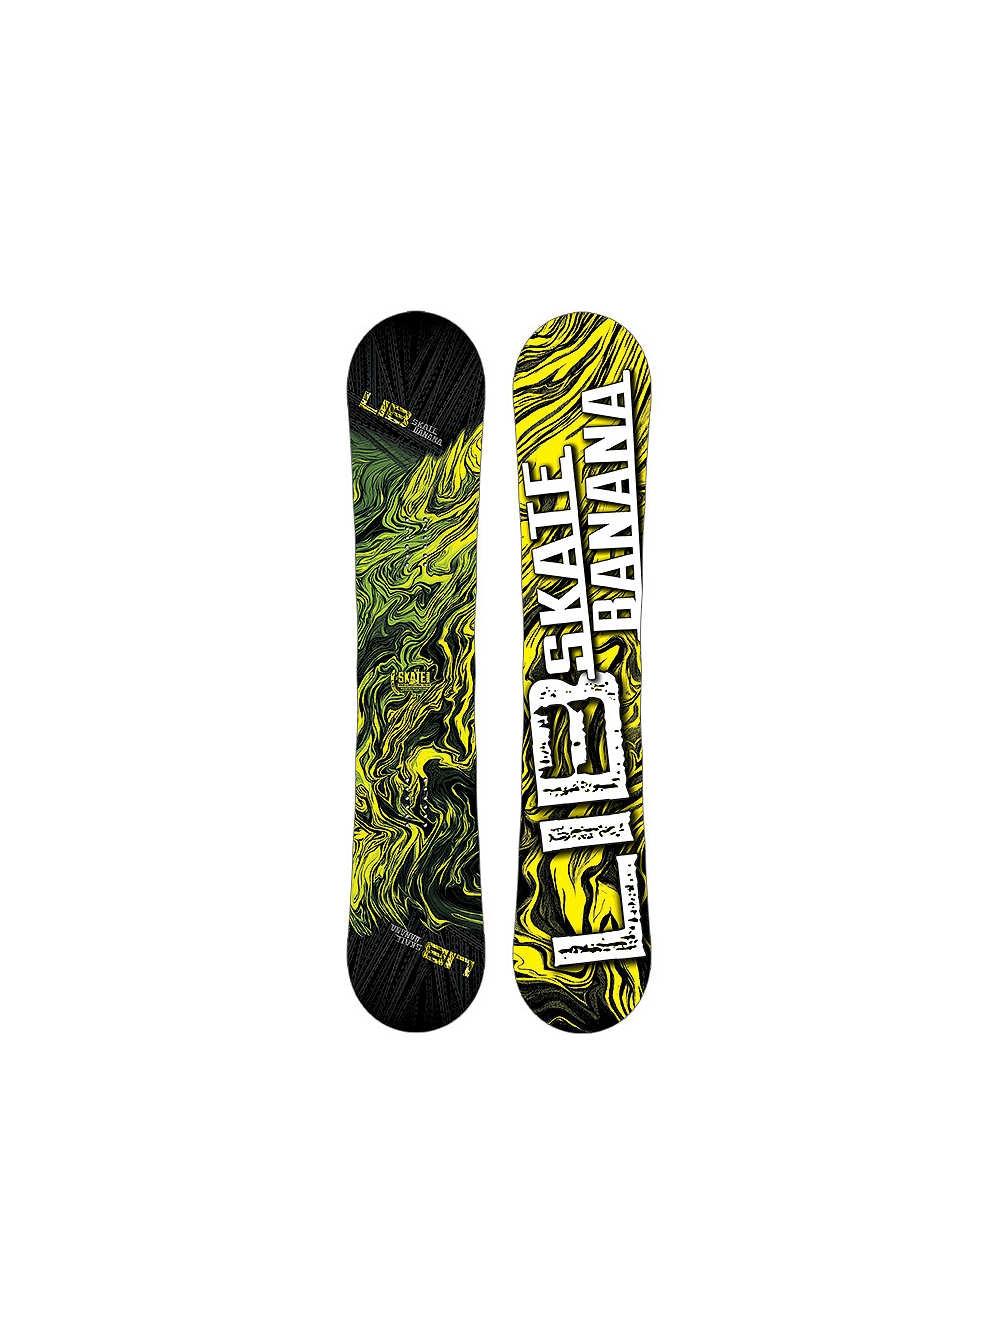 Lib Tech Skate Banana 2015